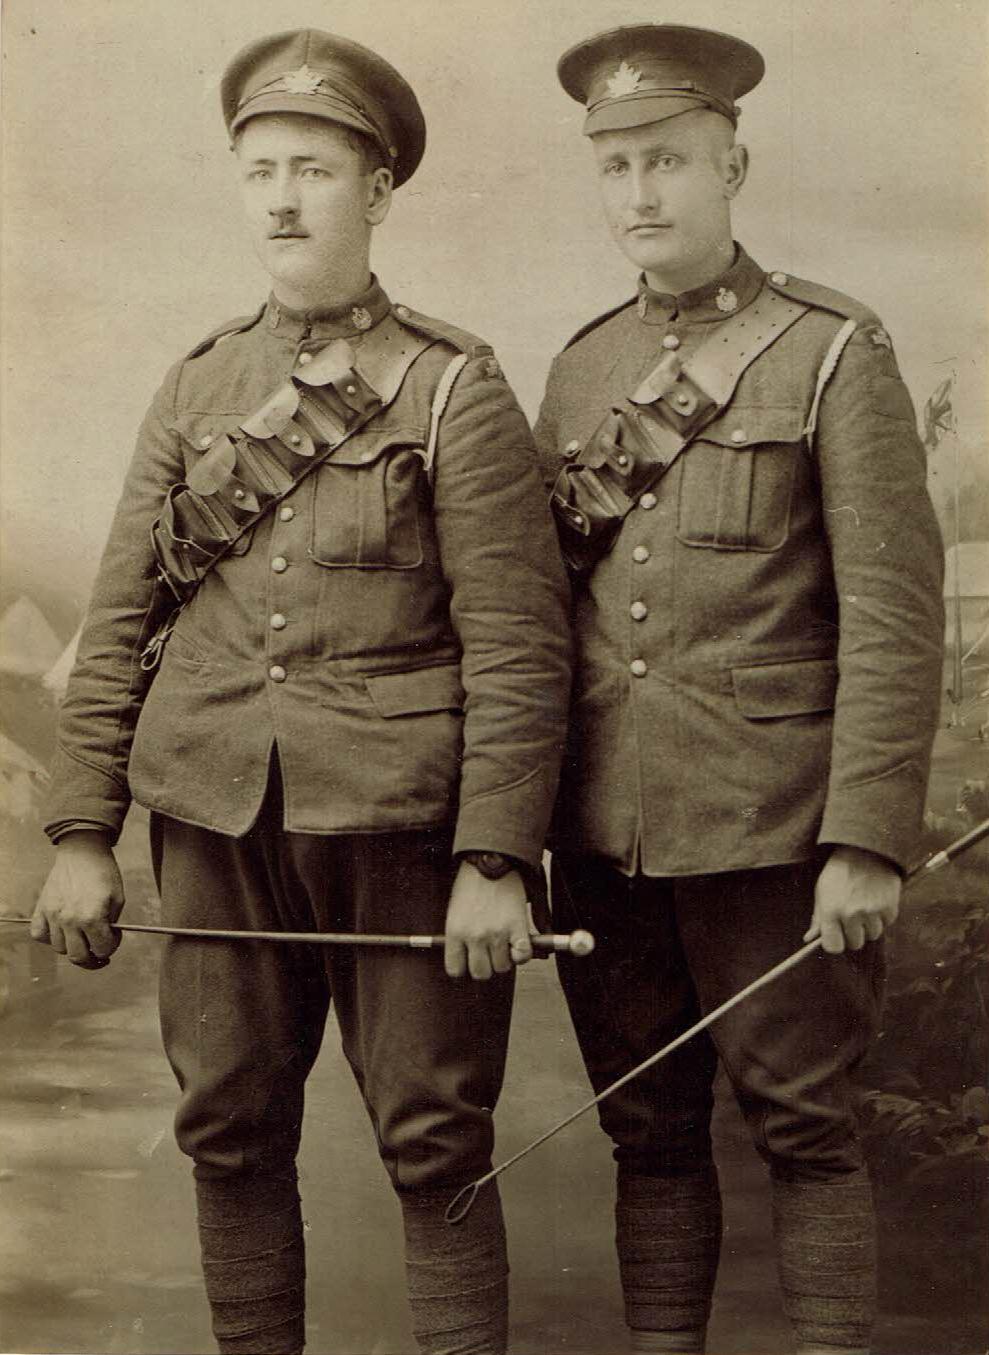 Right: John Alexander (Sandy) Robinson, veteran of the First World War